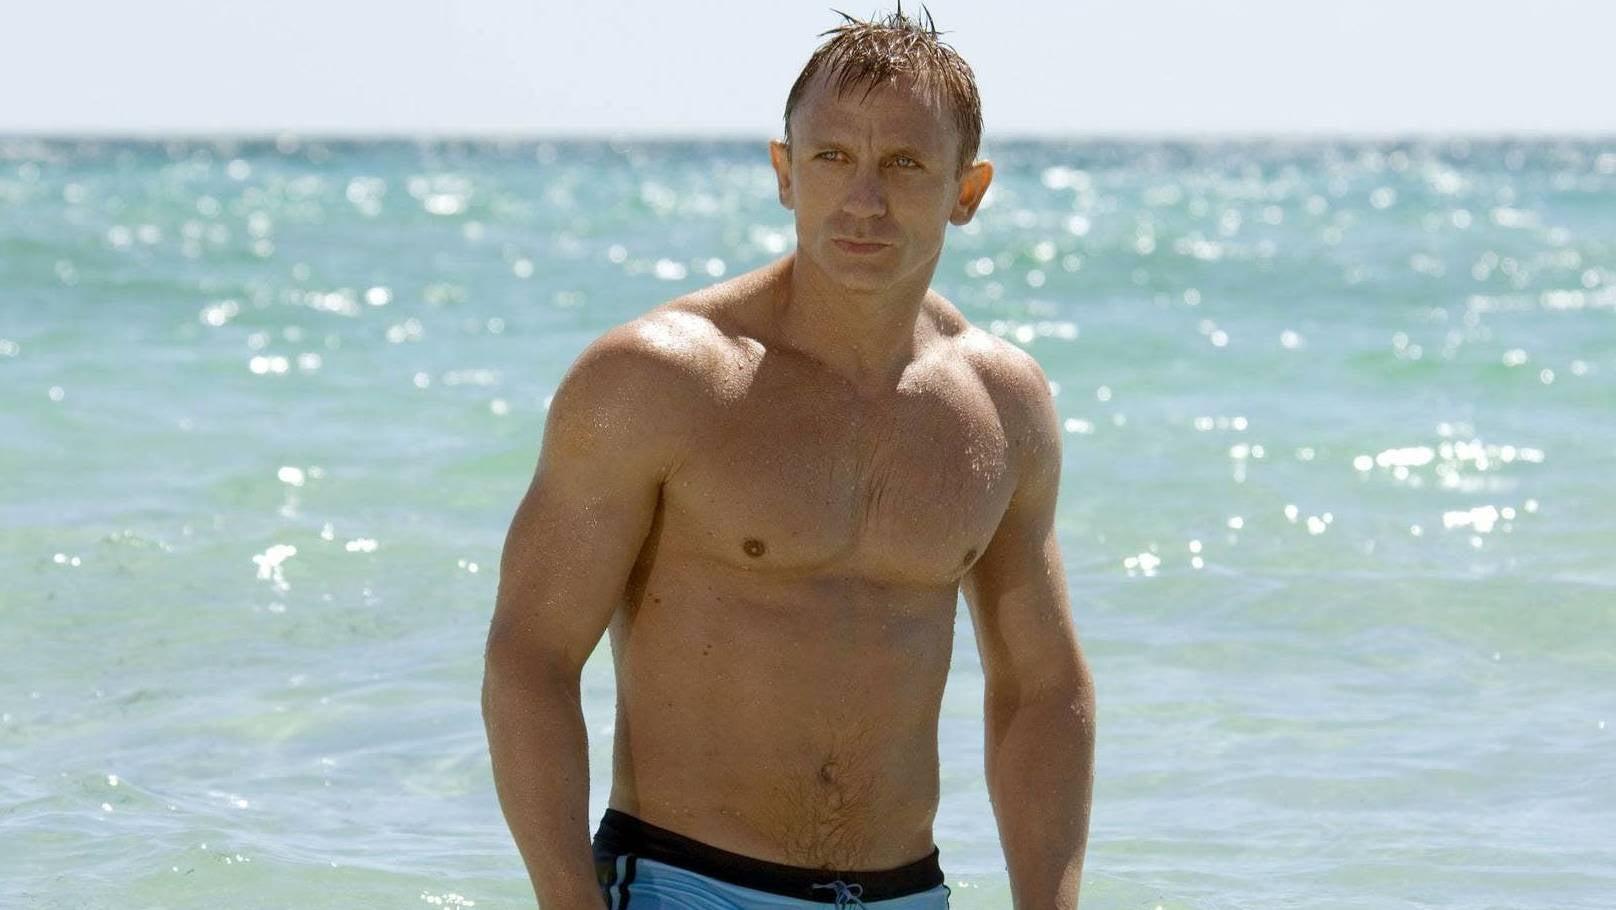 Captain Marvel's Lashana Lynch And Rami Malek Join Daniel Craig's Final Turn As Bond, James Bond